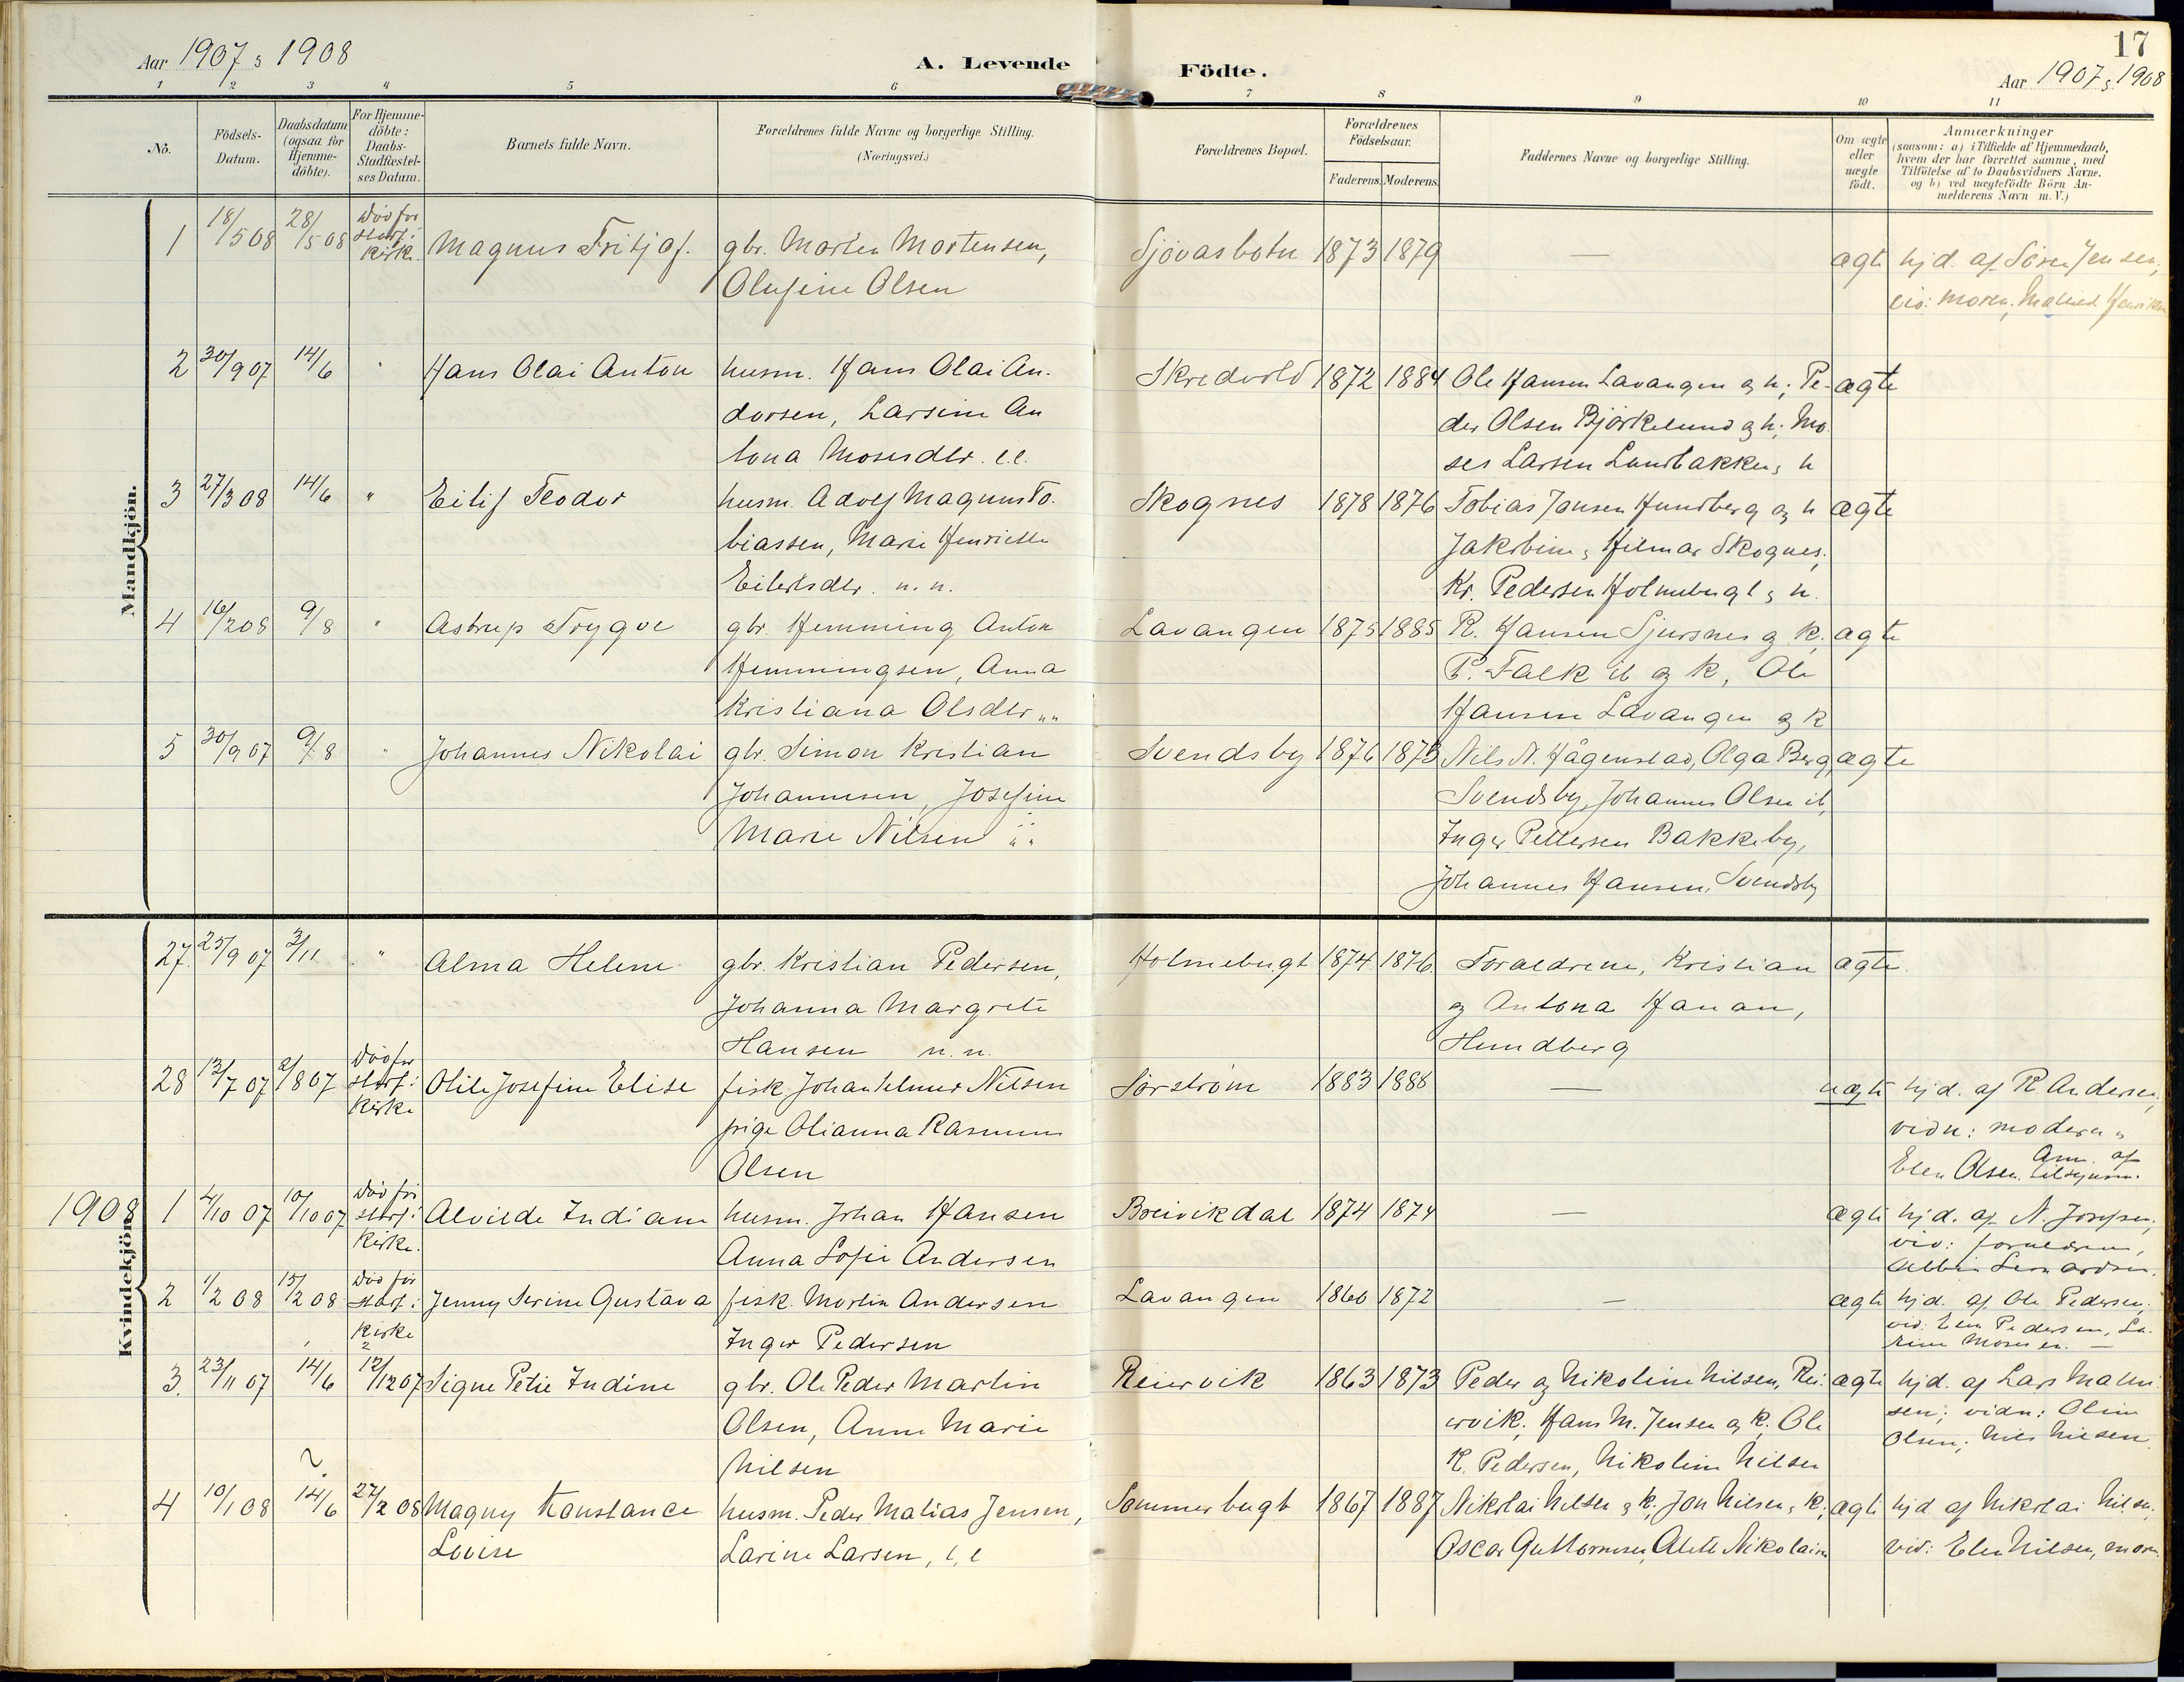 SATØ, Lyngen sokneprestembete, Ministerialbok nr. 14, 1905-1920, s. 17